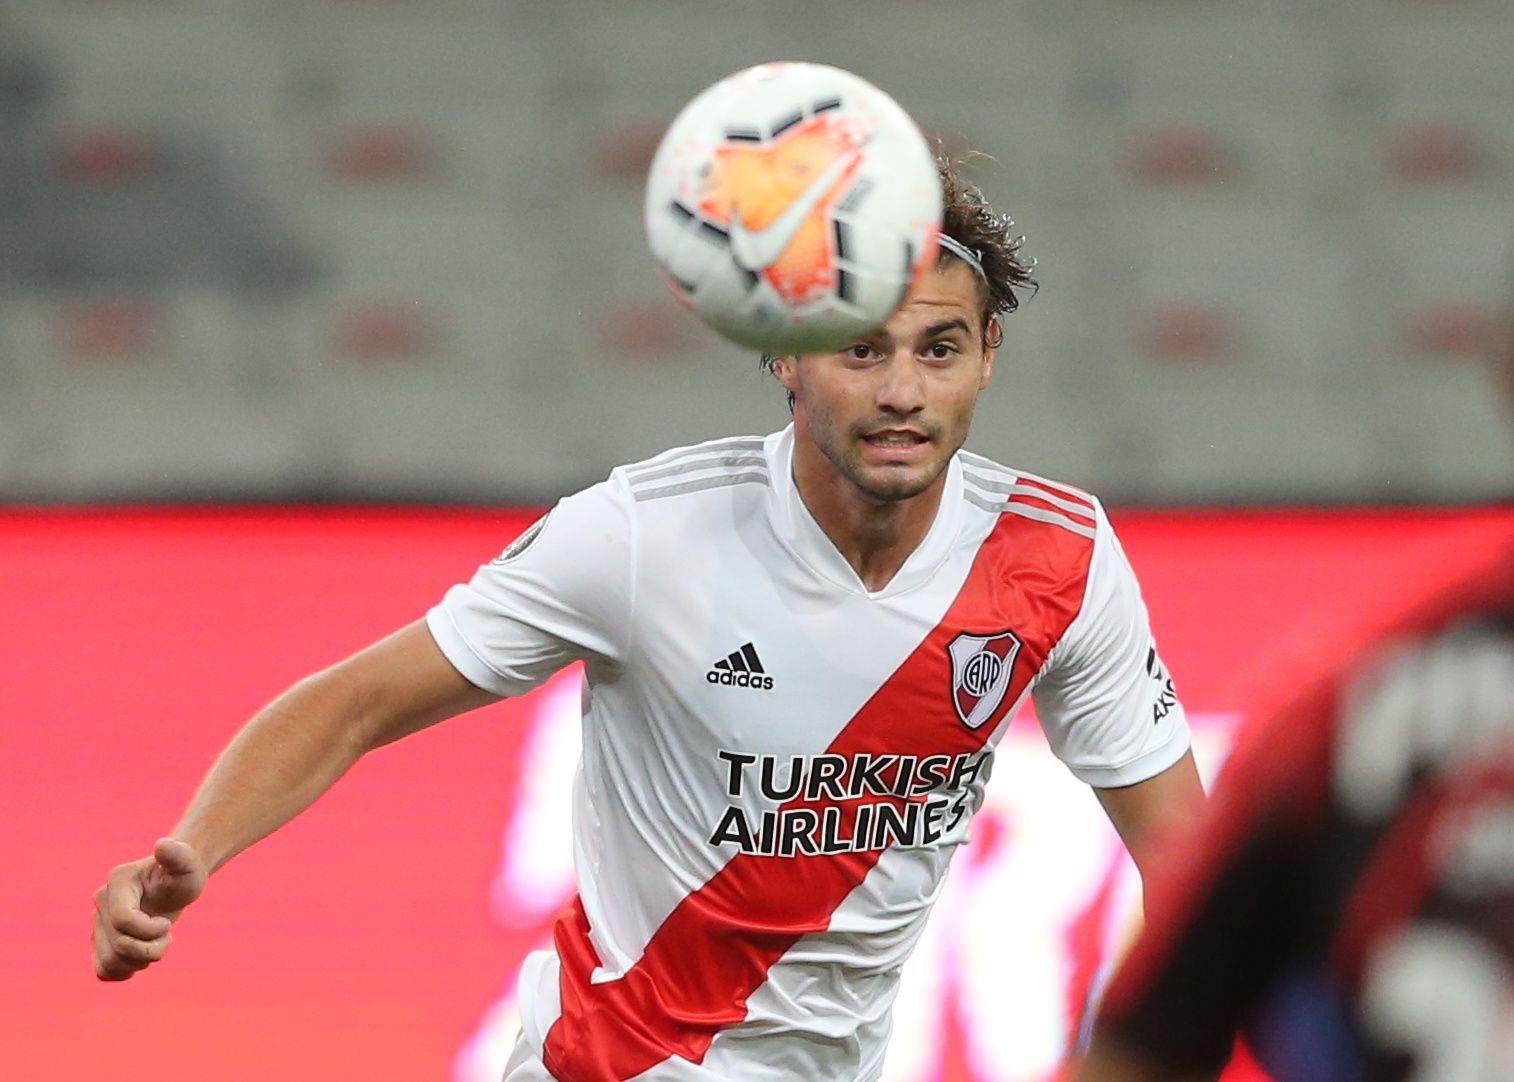 Atlanta United, busca concretar el arribo de Santiago Sosa (REUTERS/Rodolfo Buhrer)